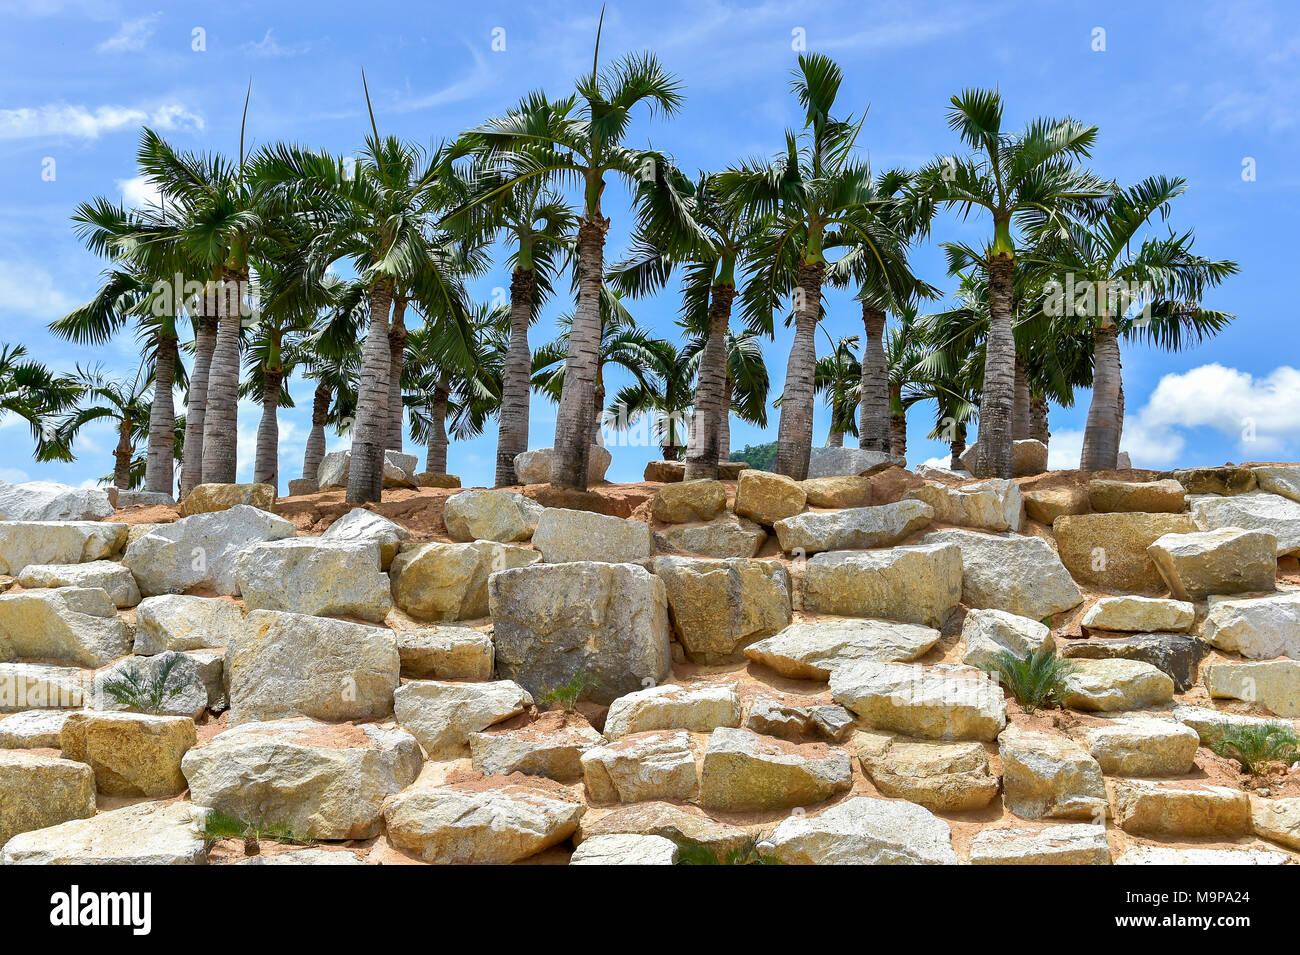 Imitation Stonehenge with Palms, Nong Nooch Tropical Botanical Garden, Pattaya, Thailand - Stock Image